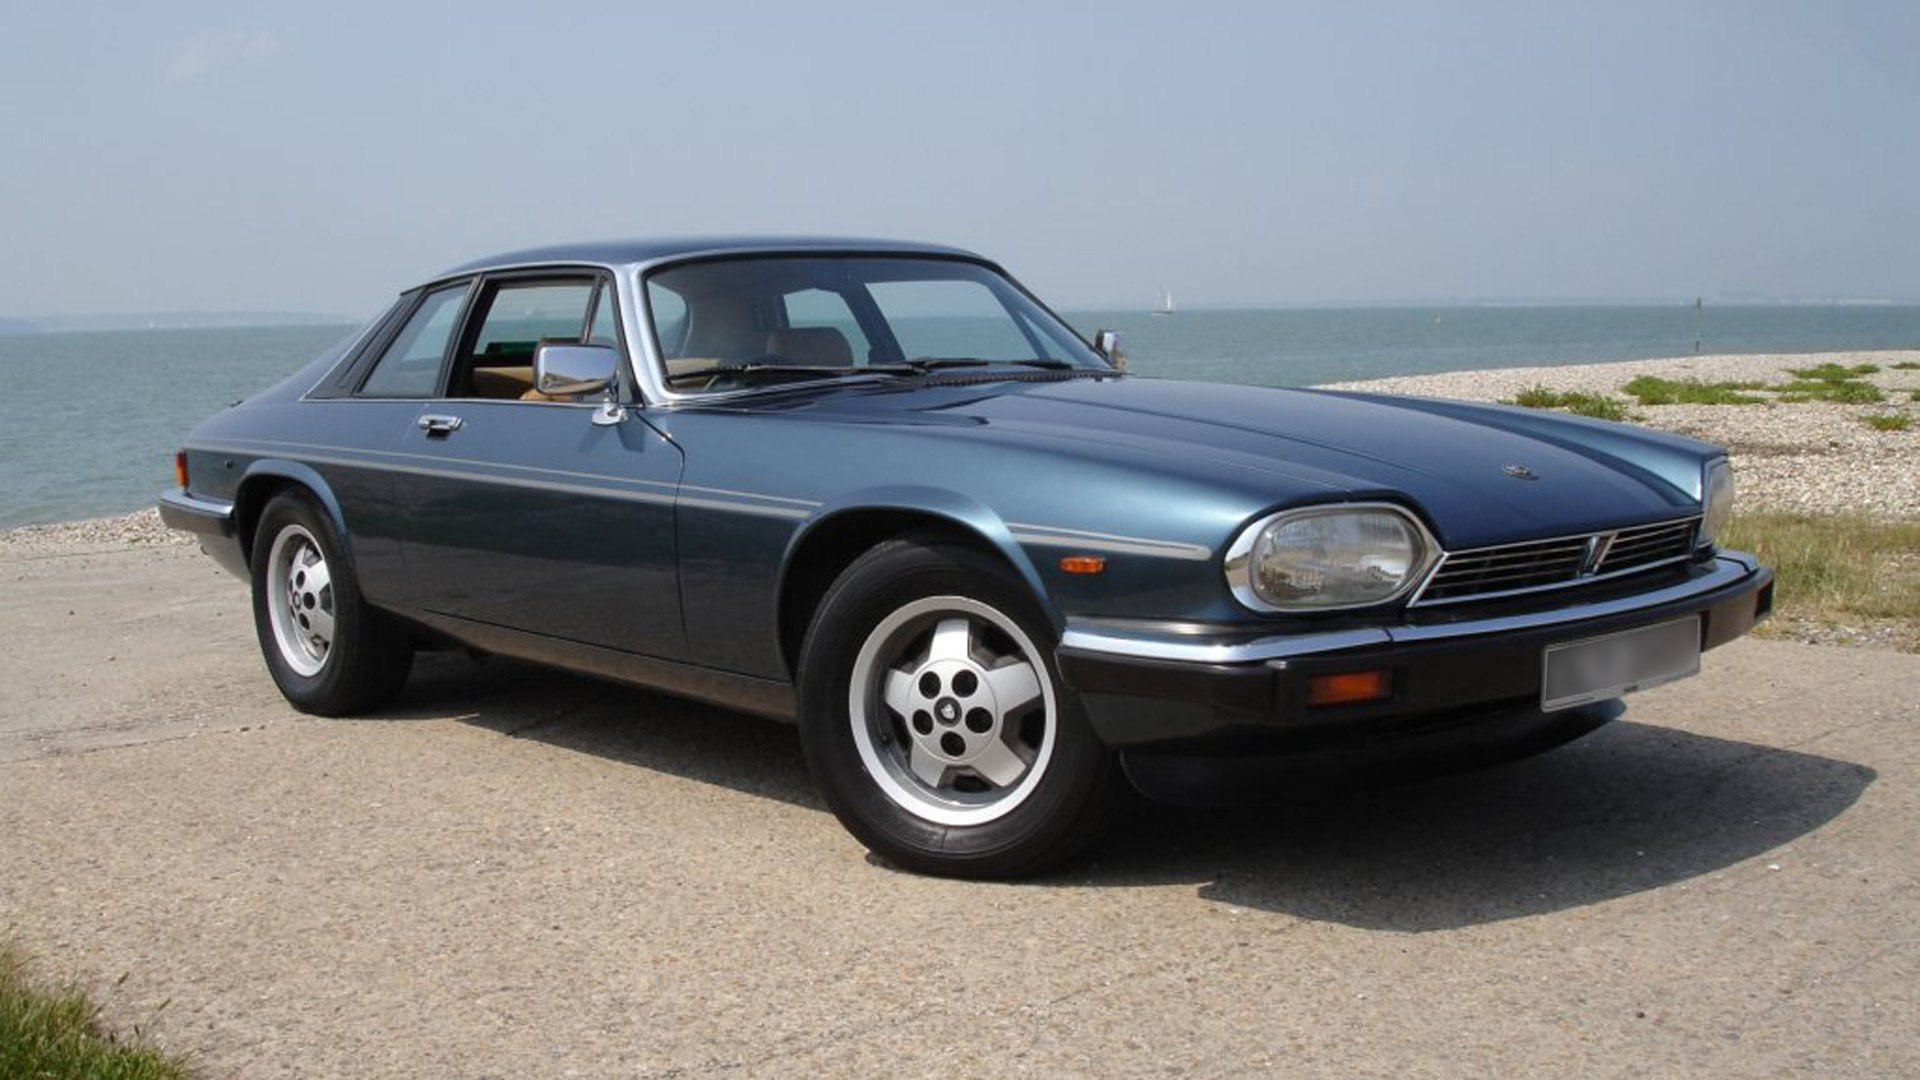 2020 Jaguar Xj Coupe Exterior and Interior